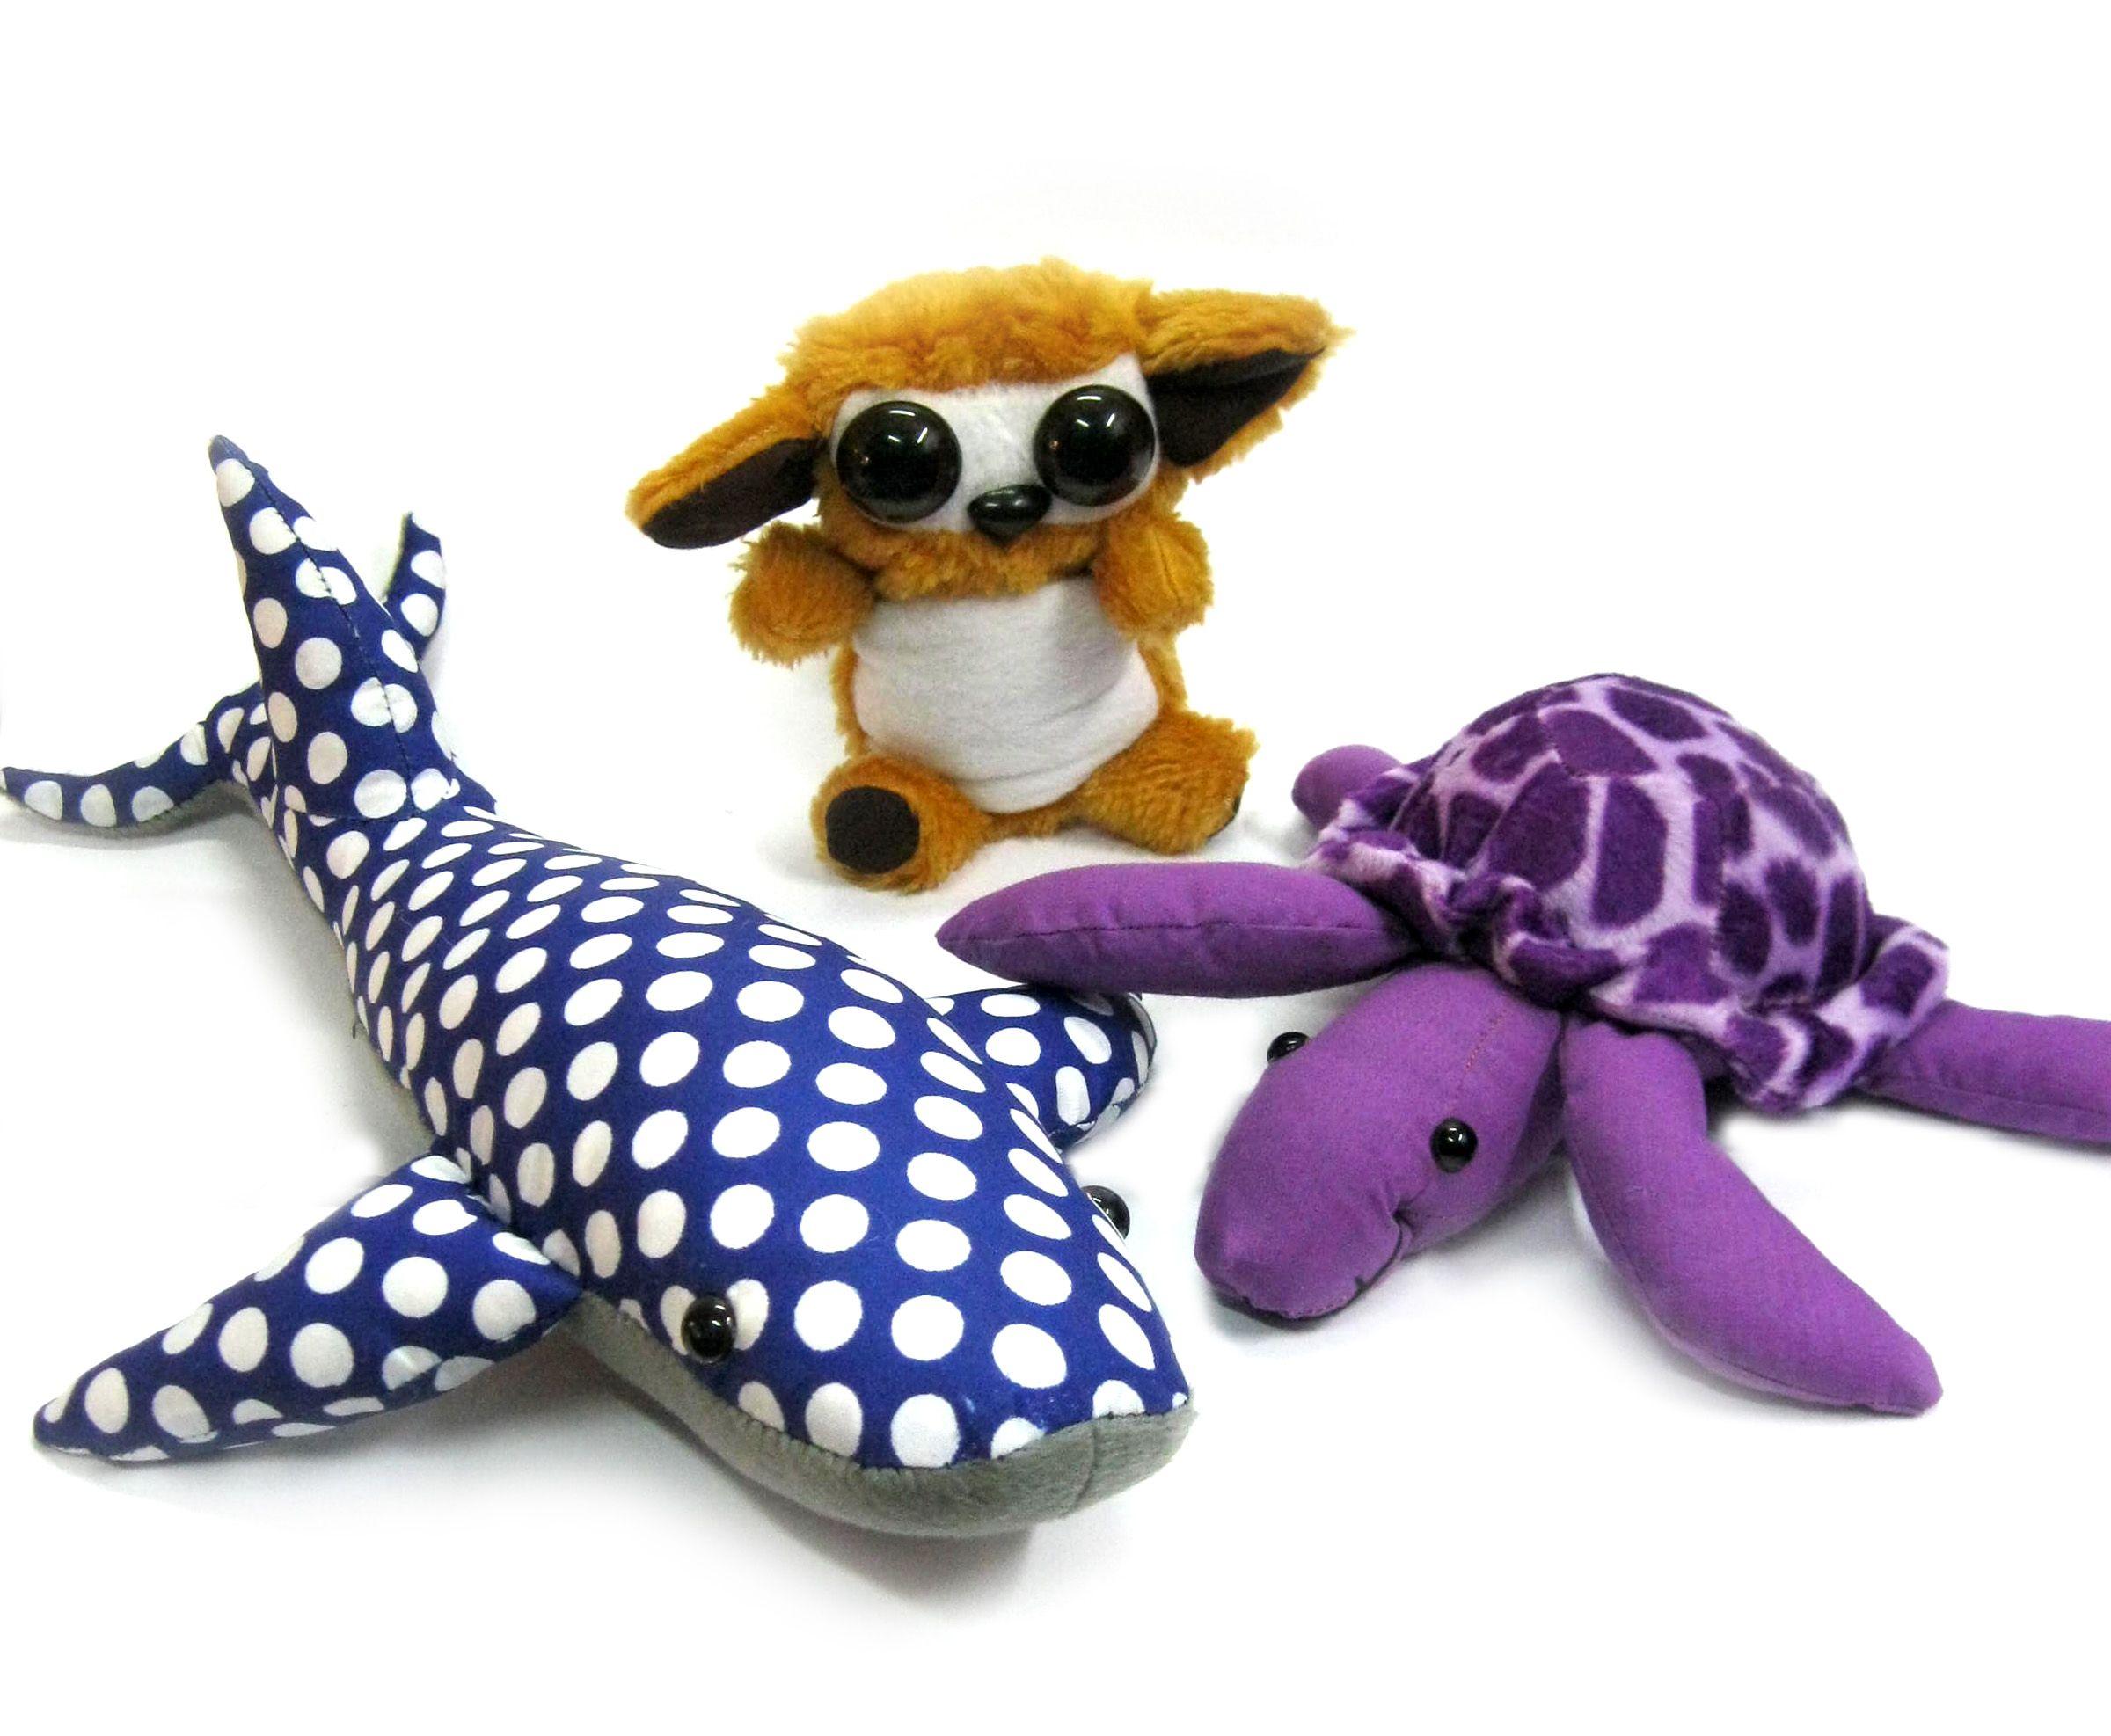 Adorable Butanding Pawikan And Tarsier Stuffed Toys Monster Dolls Dinosaur Stuffed Animal Toys